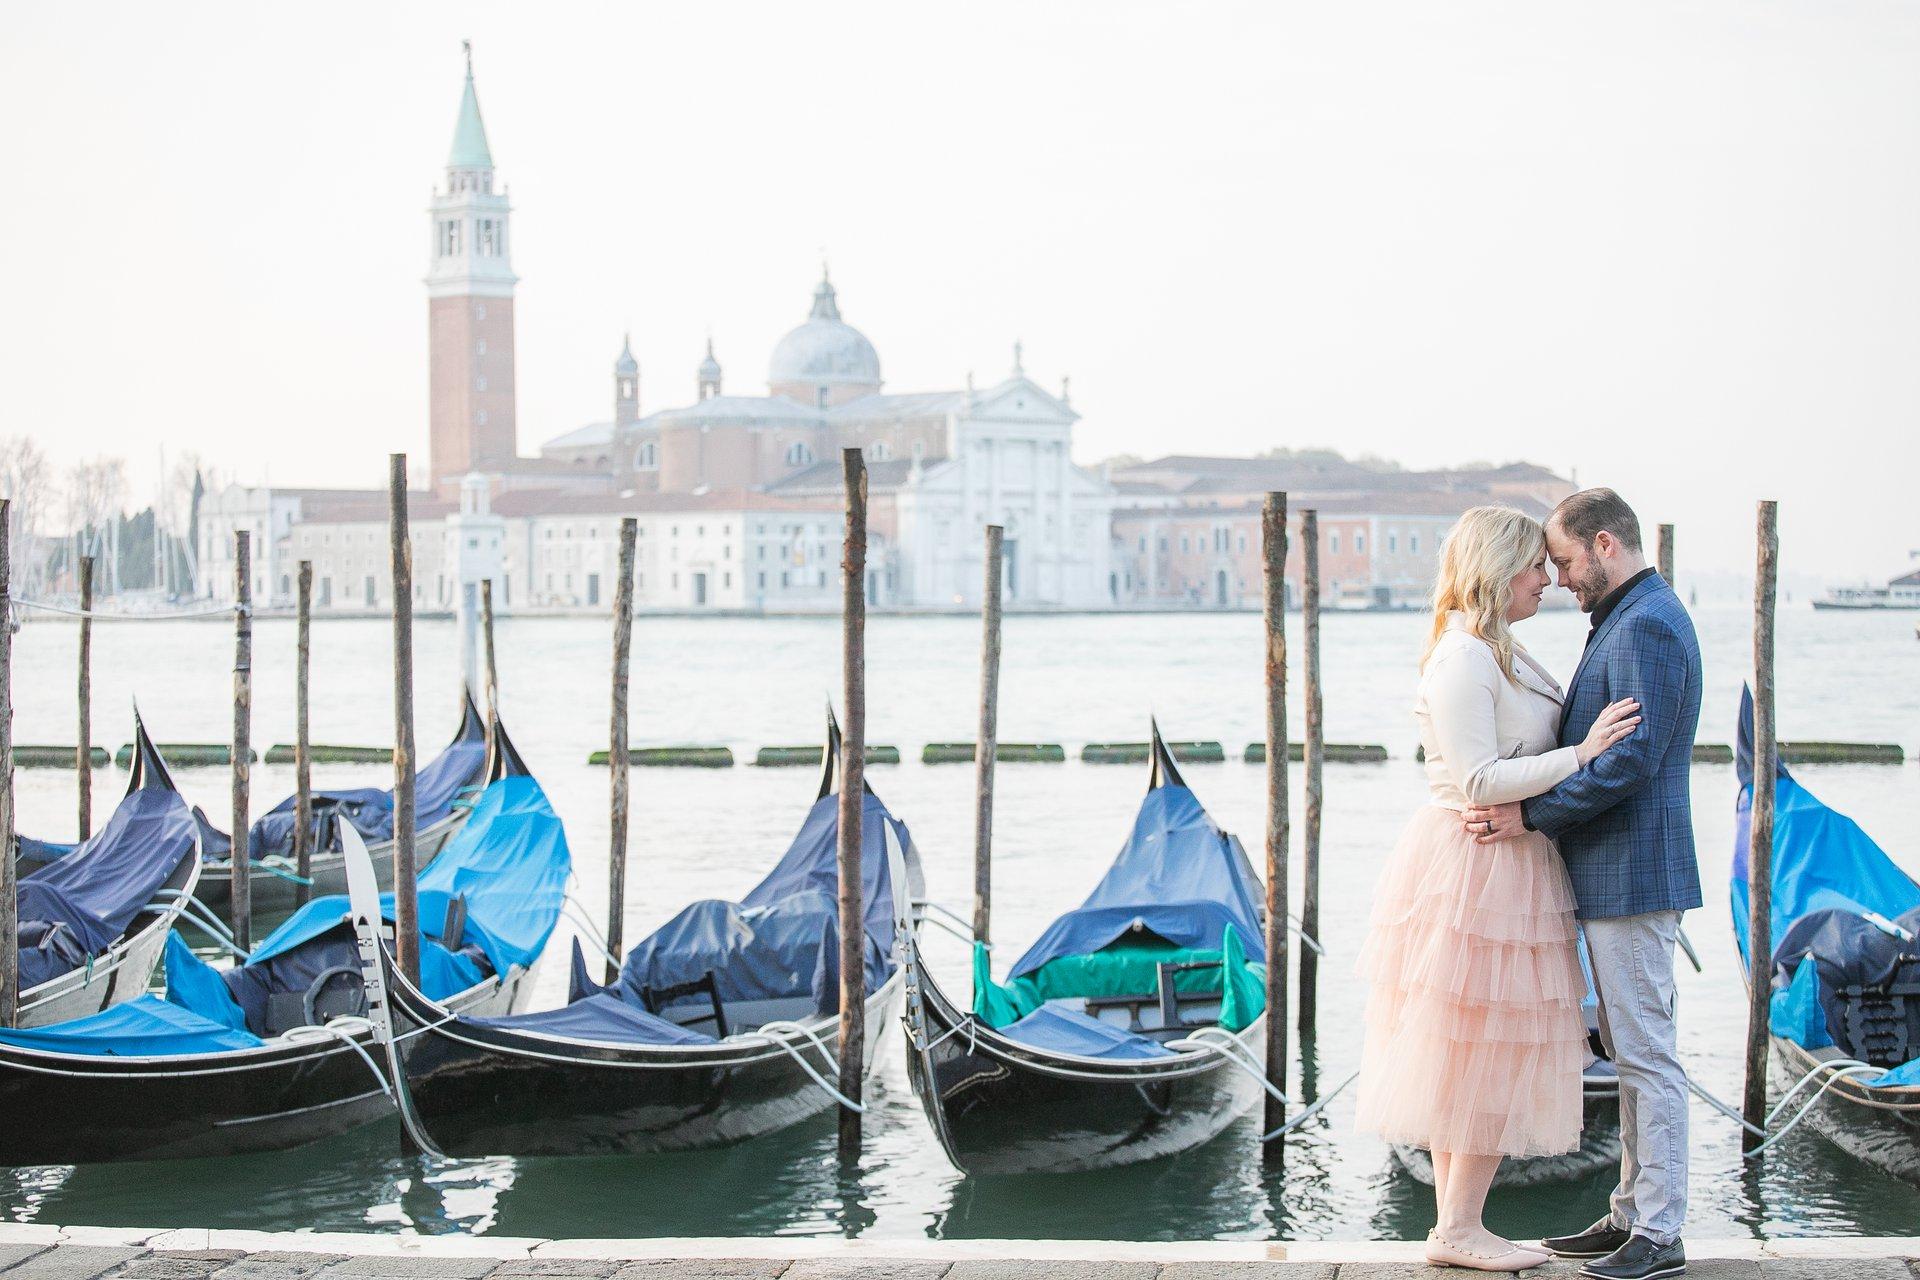 Venice-Italy-travel-story-Flytographer-15